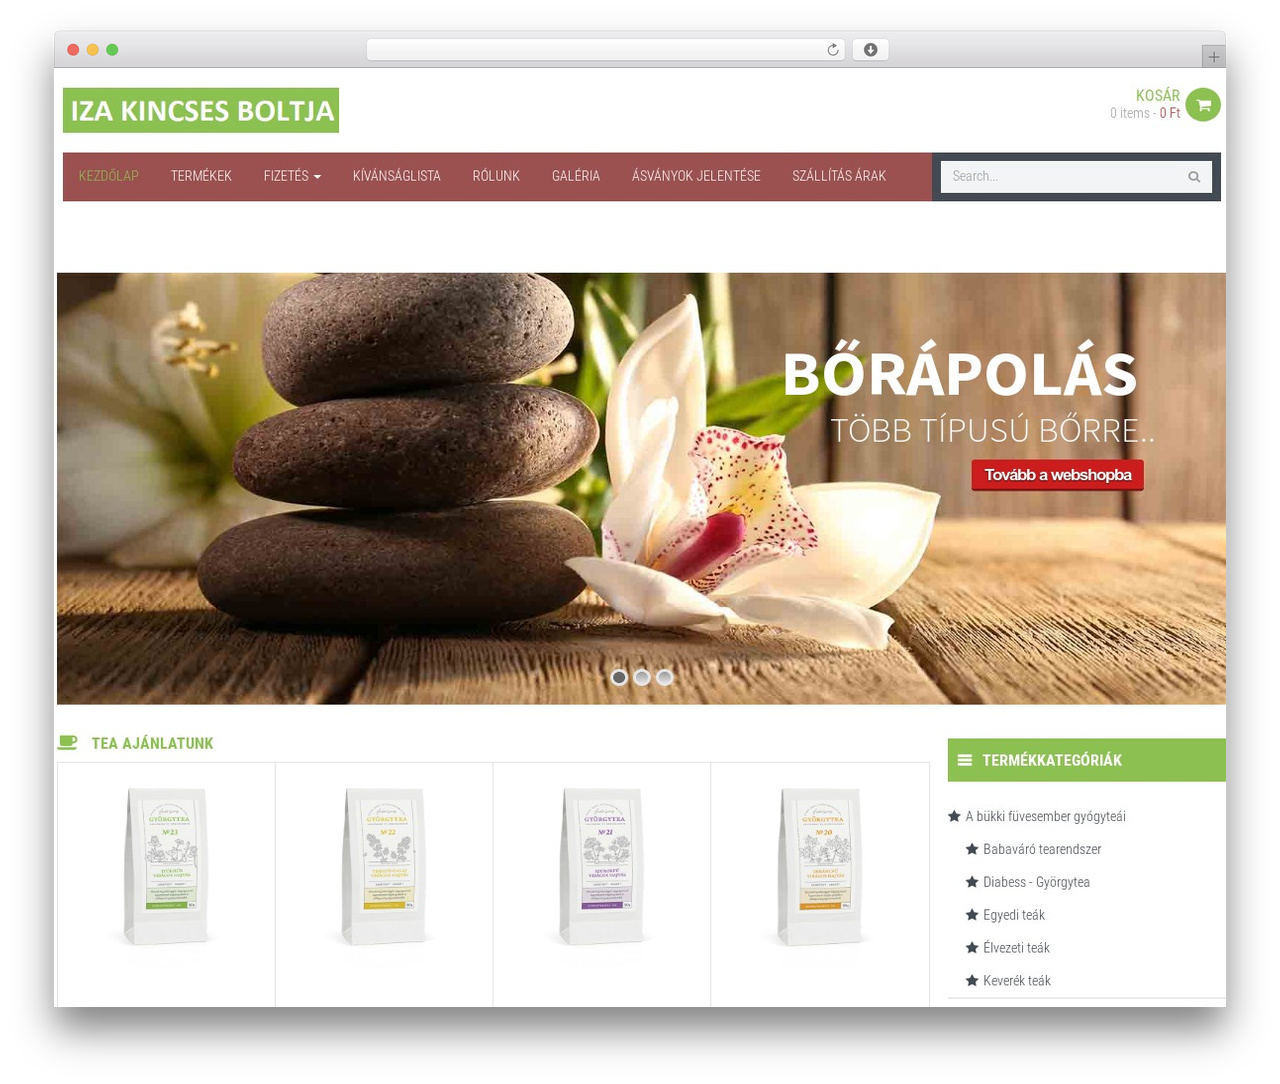 WPO Shopping premium WordPress theme - izakincsesboltja.com